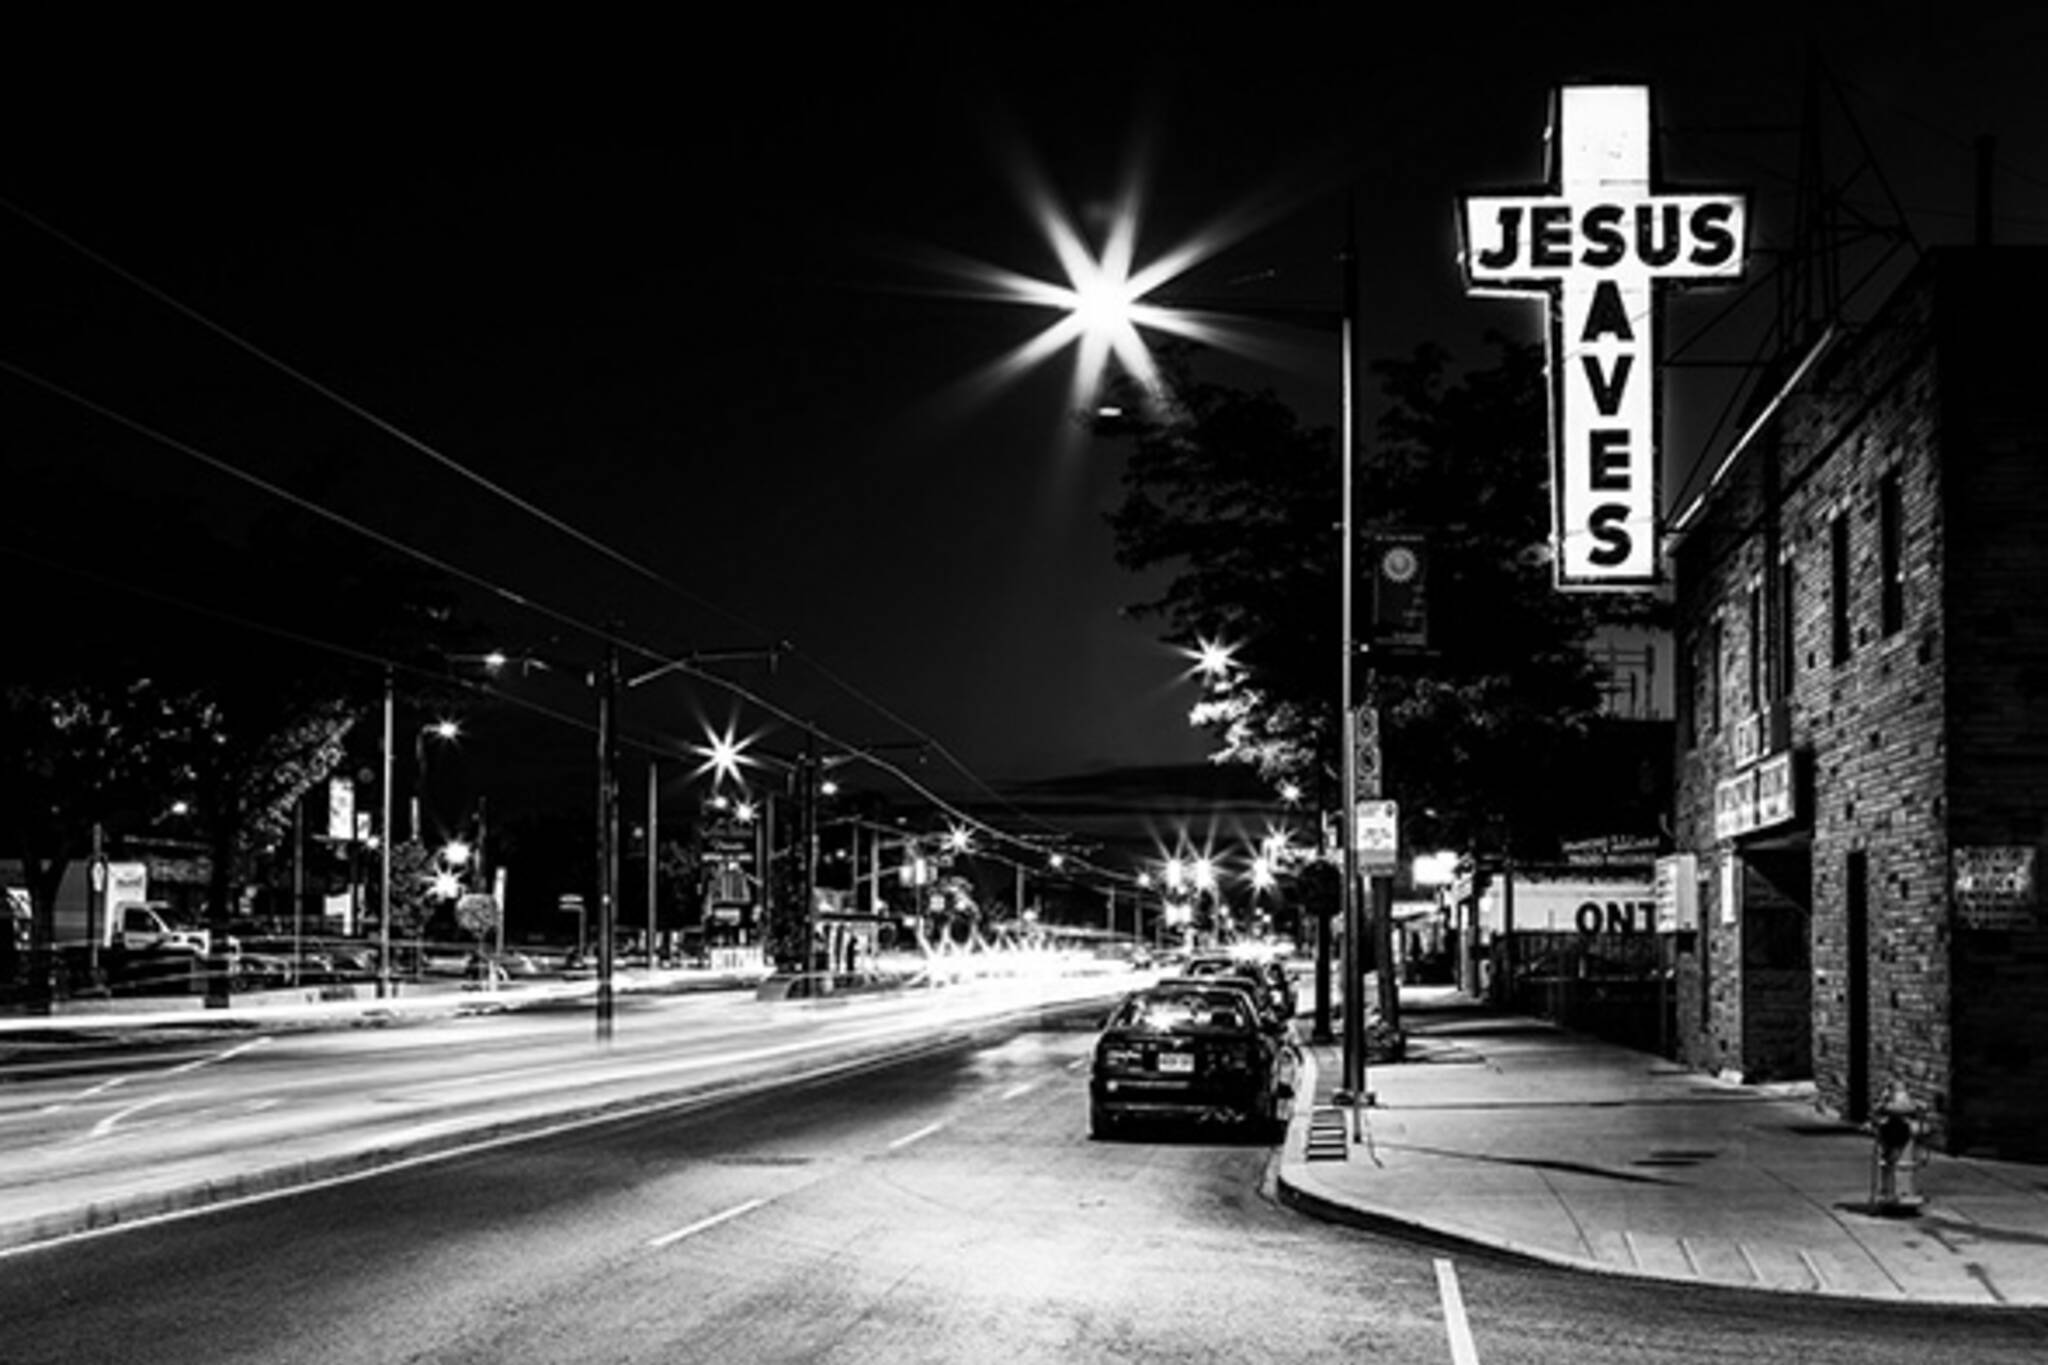 Jesus Saves sign